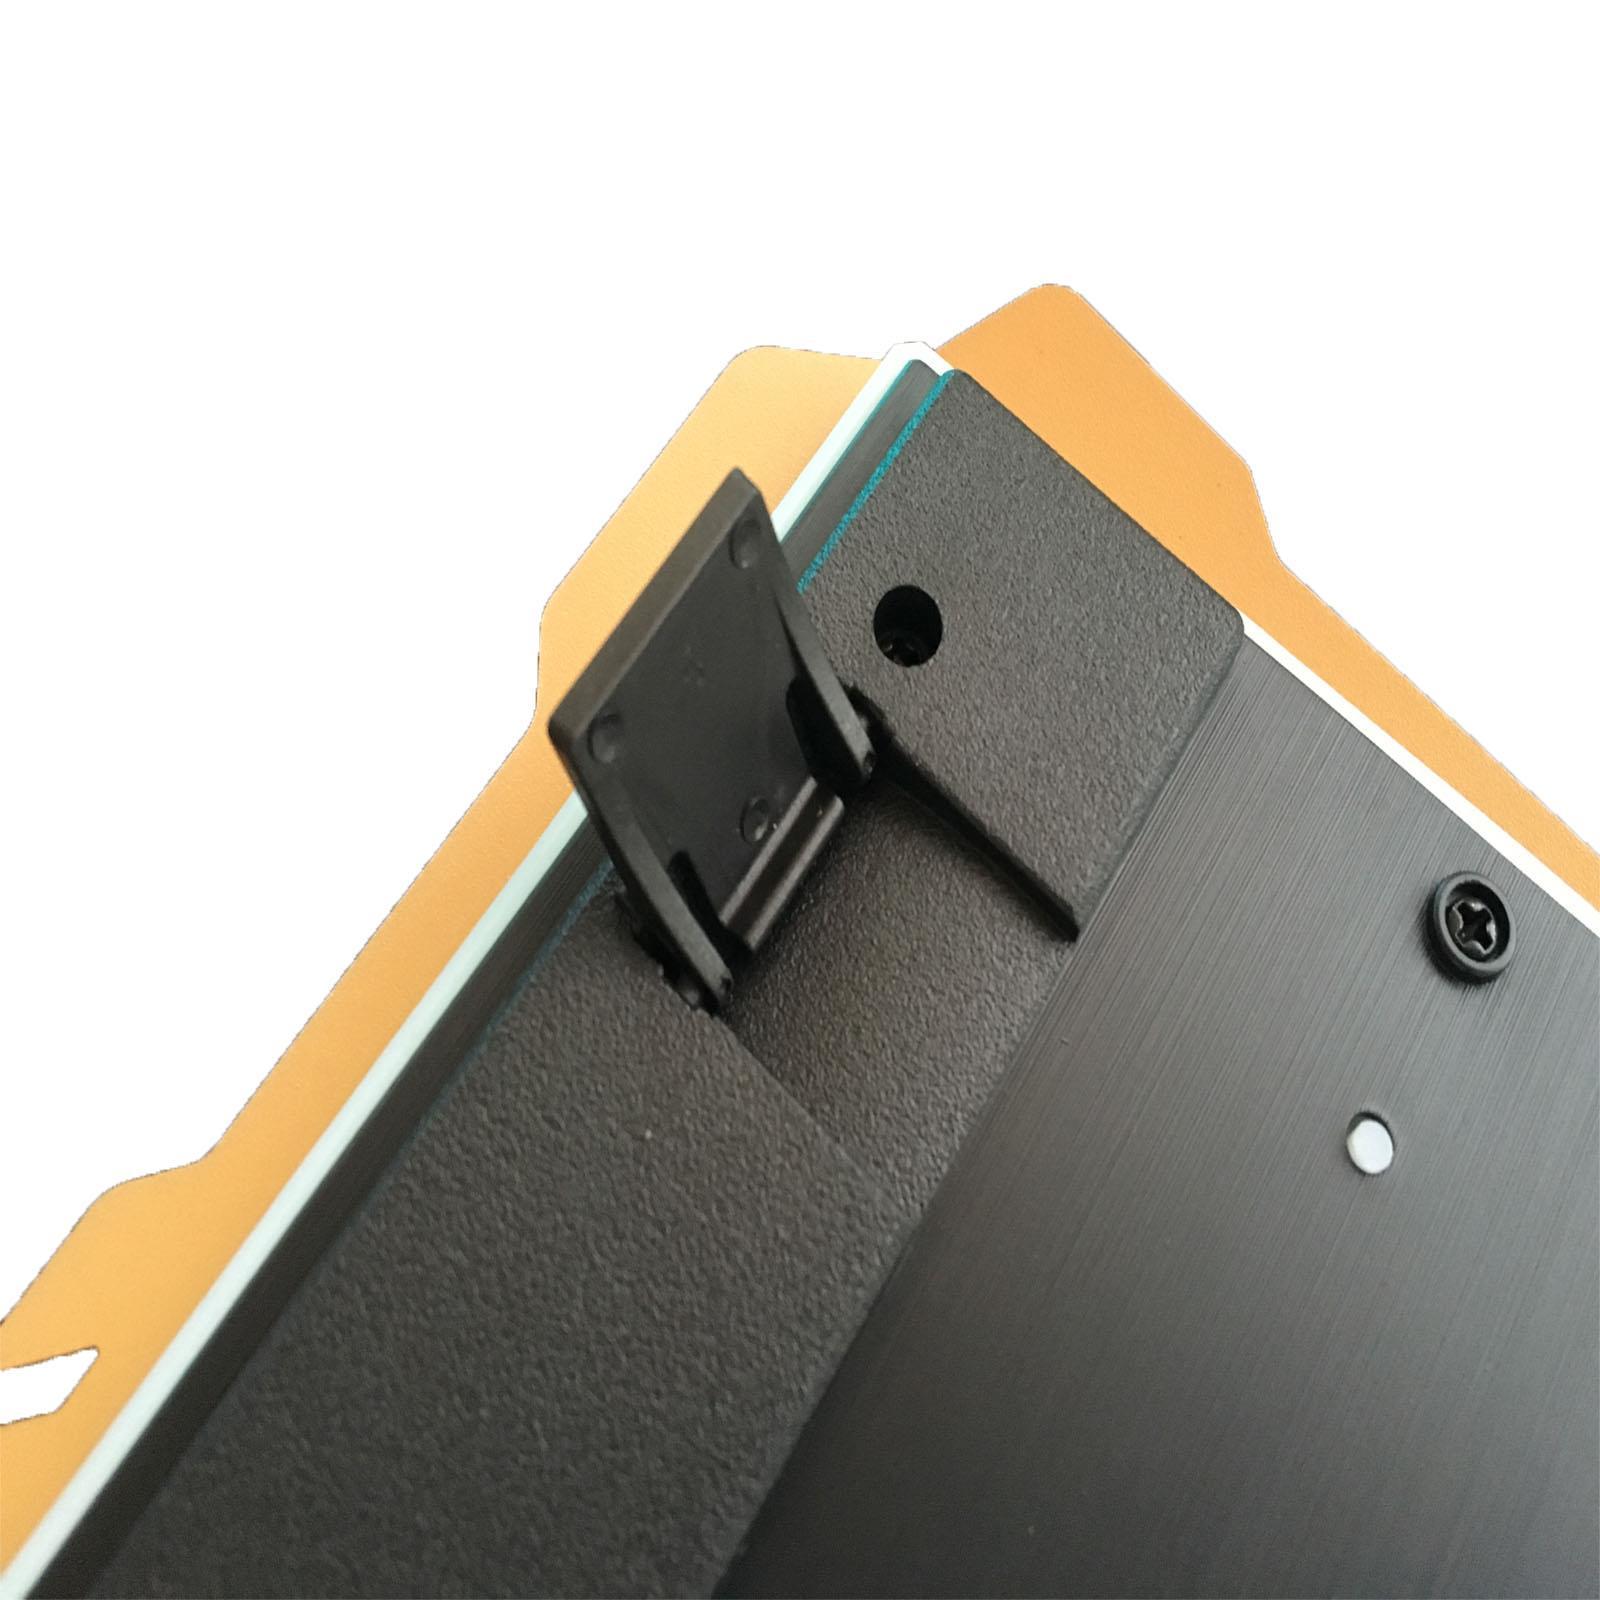 Gaming-Keyboard-Mouse-Backlit-Rainbow-LED-USB-Set-for-PC-Laptop-PS4-Xbox-One thumbnail 46